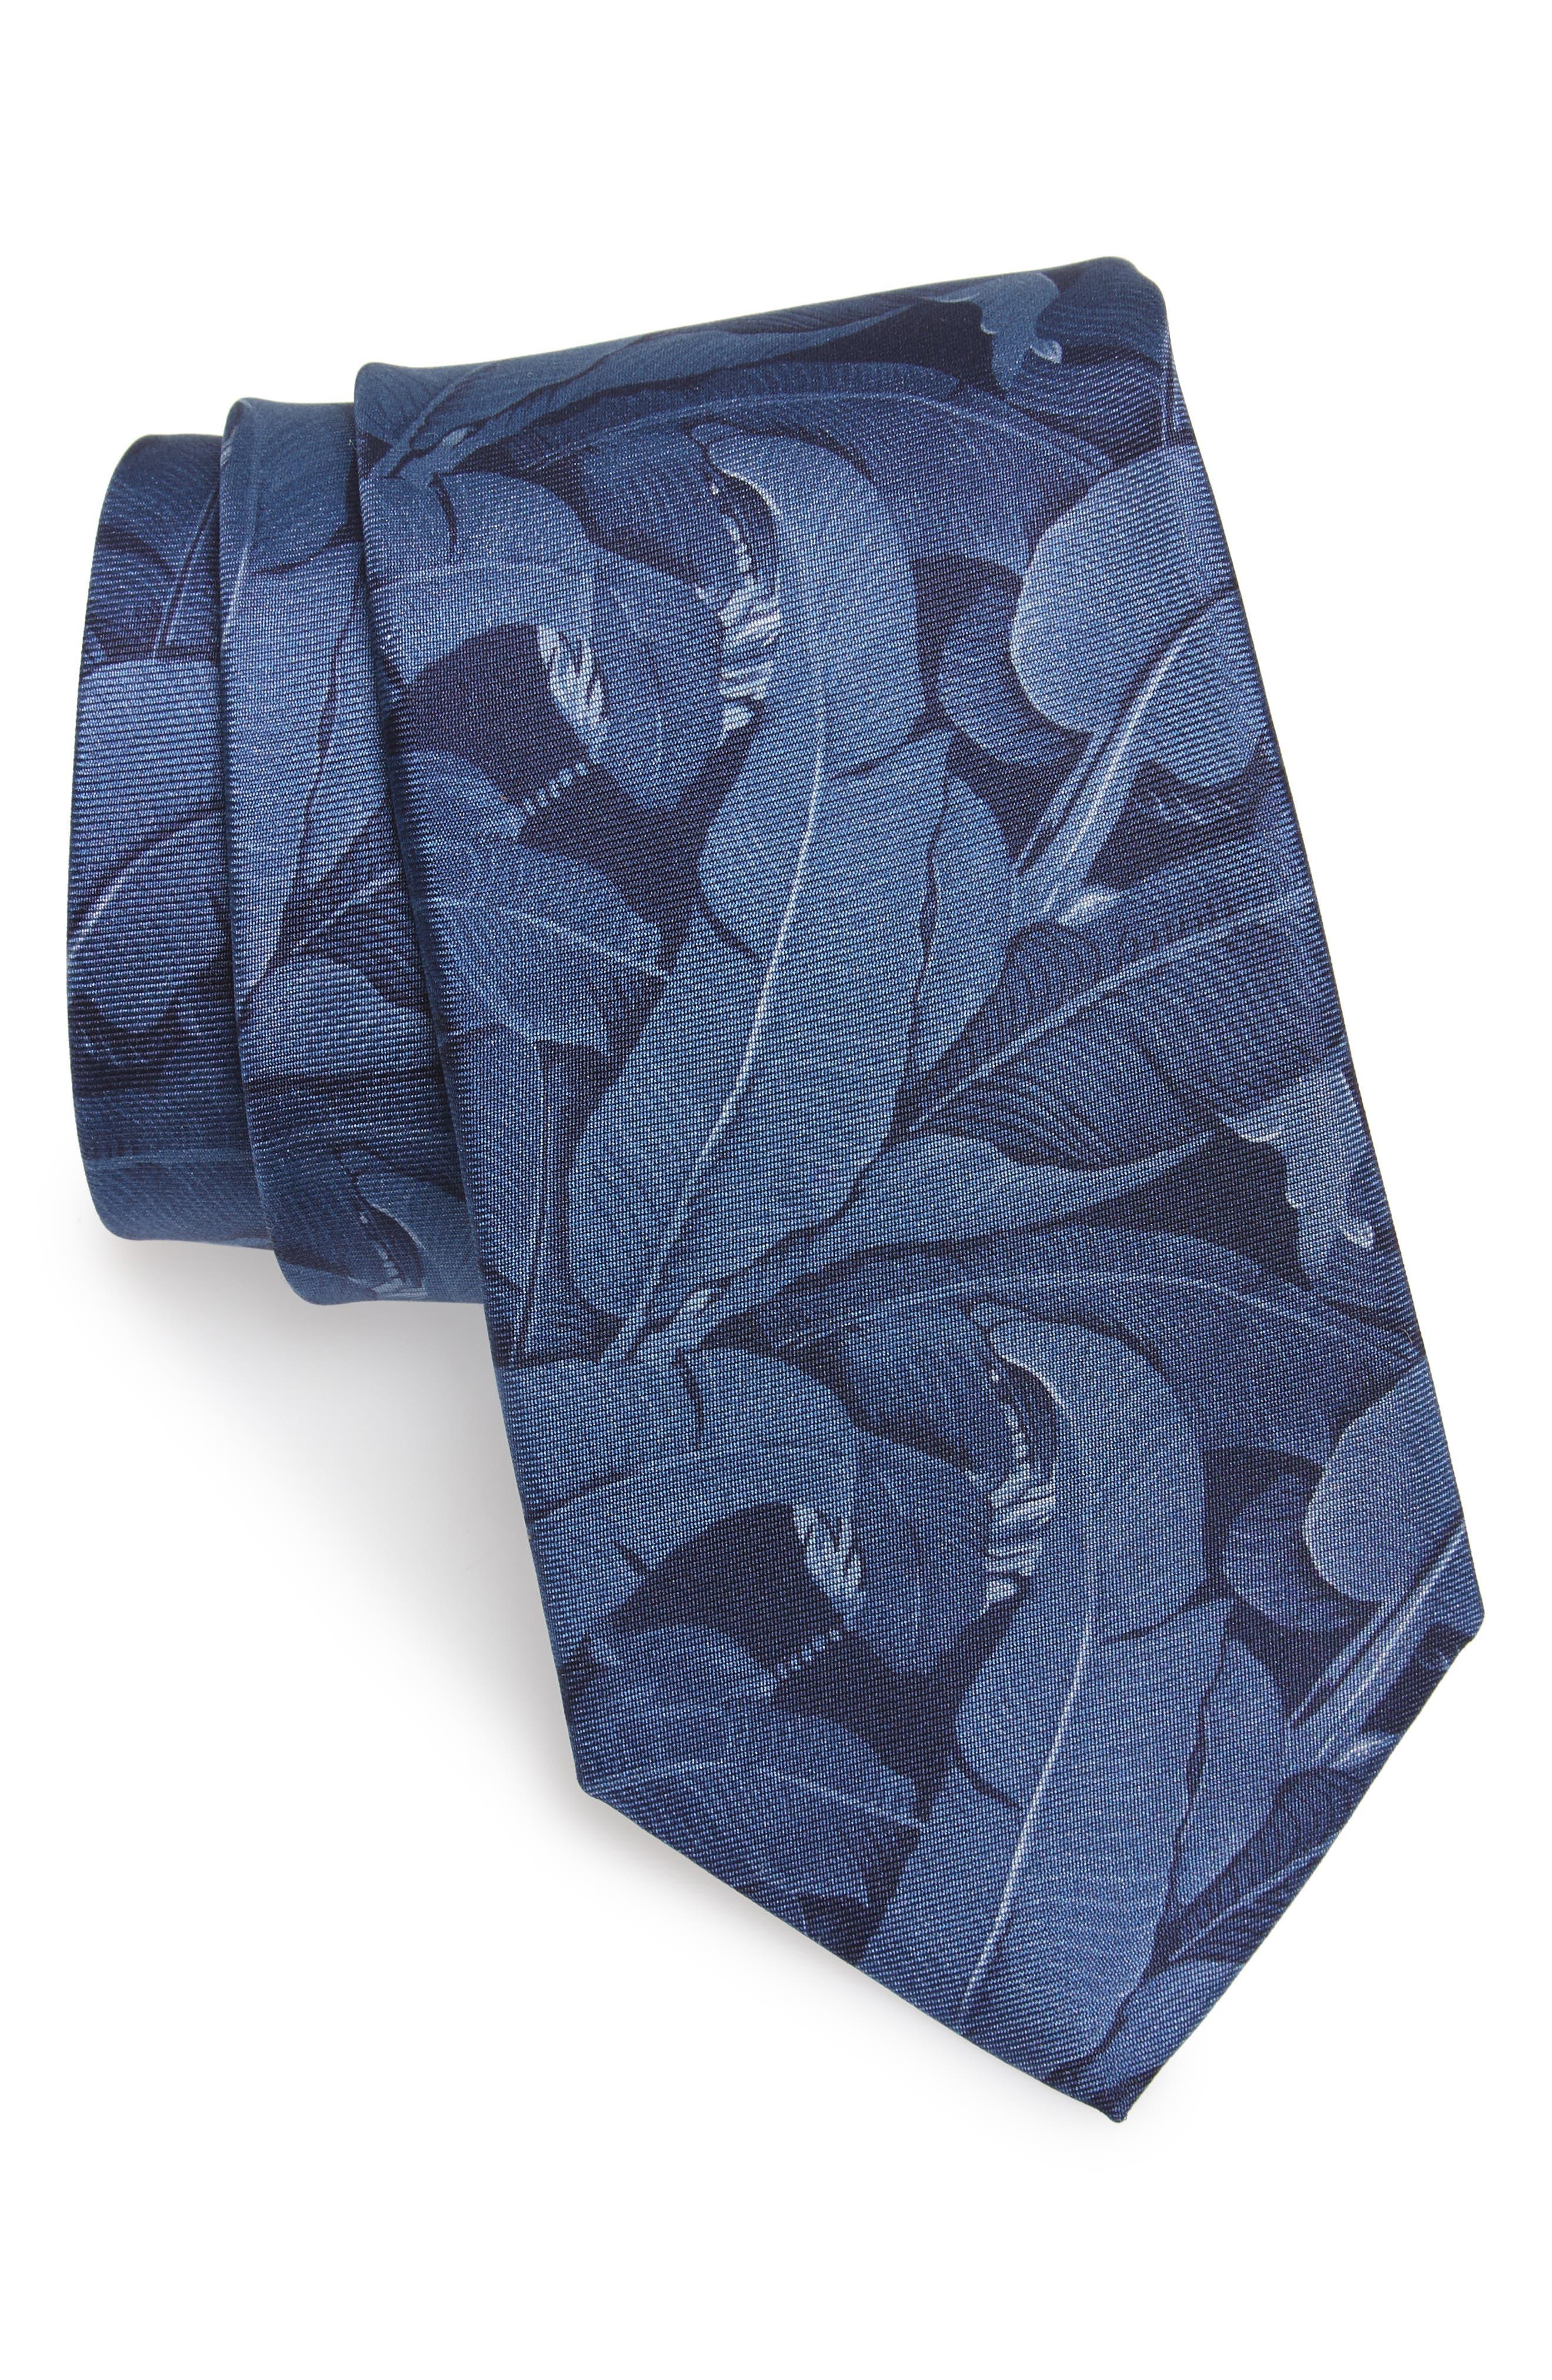 Banana Leaf Silk Tie,                             Main thumbnail 1, color,                             400